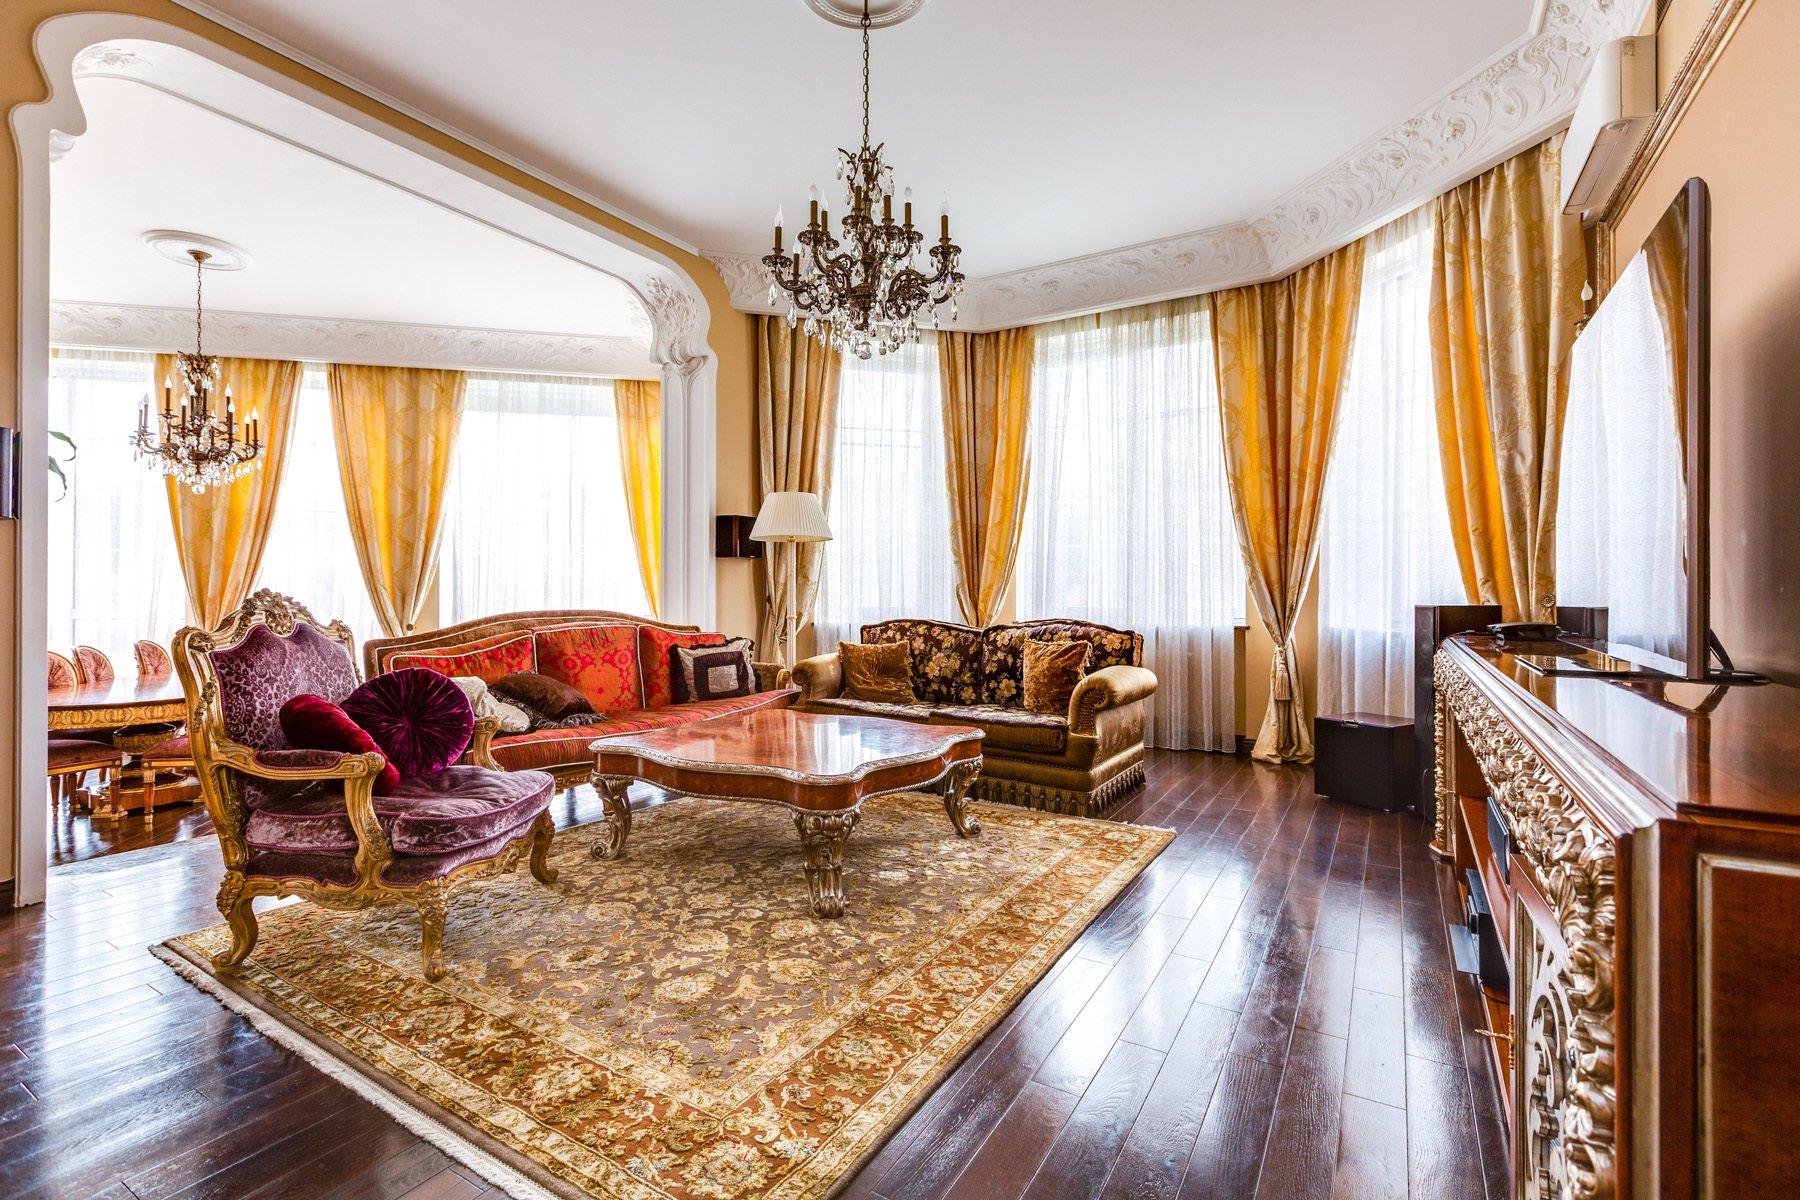 House in Pozdnyakovo, Moscow, Russia 1